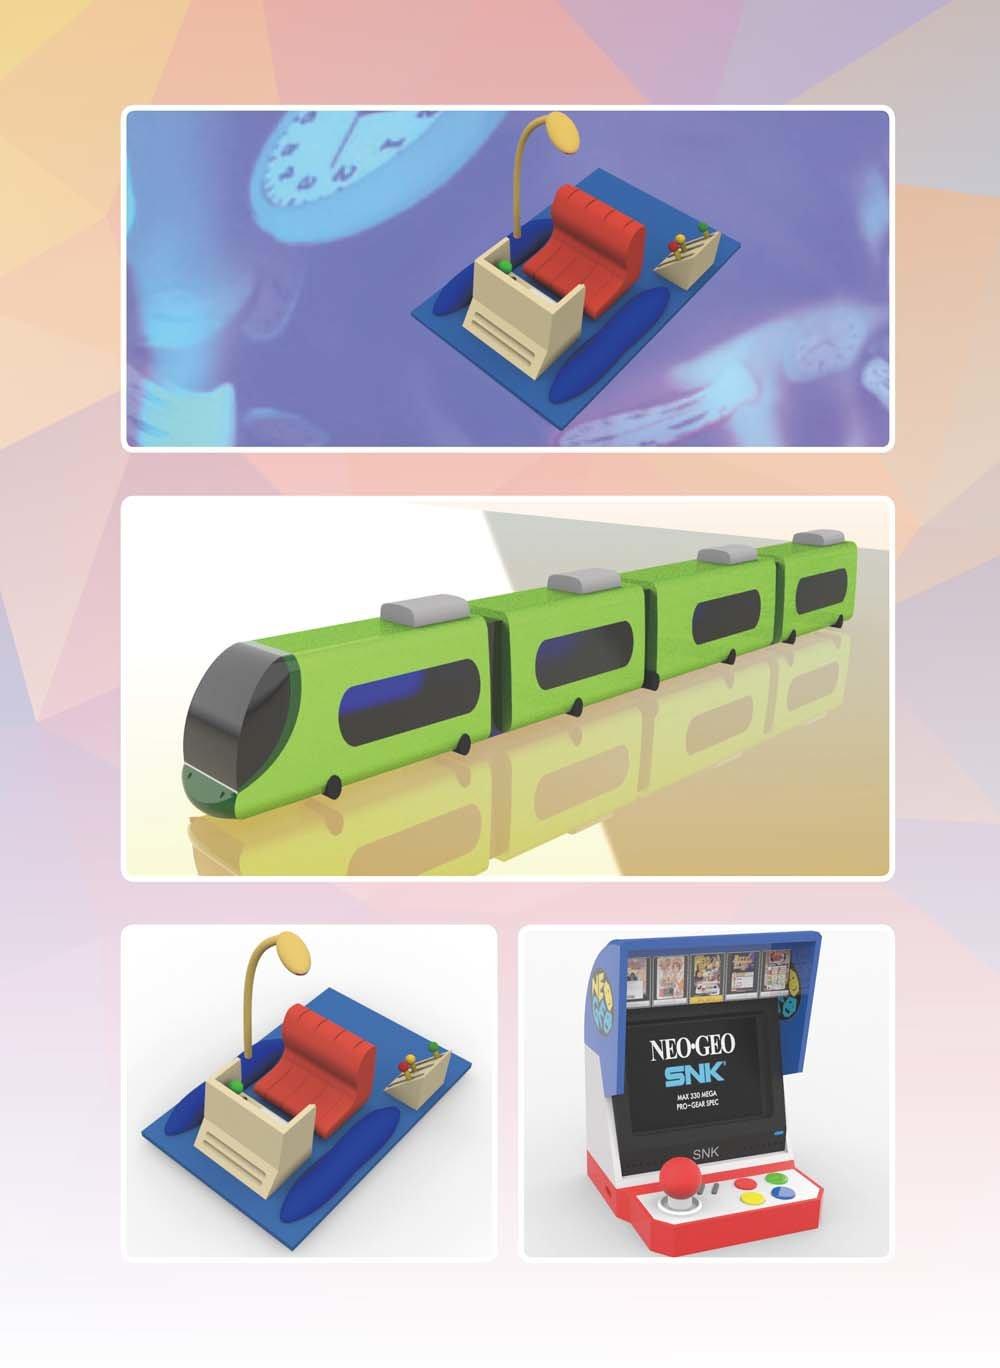 Rhinoceros 6 全攻略:自學設計與 3D建模寶典-preview-13